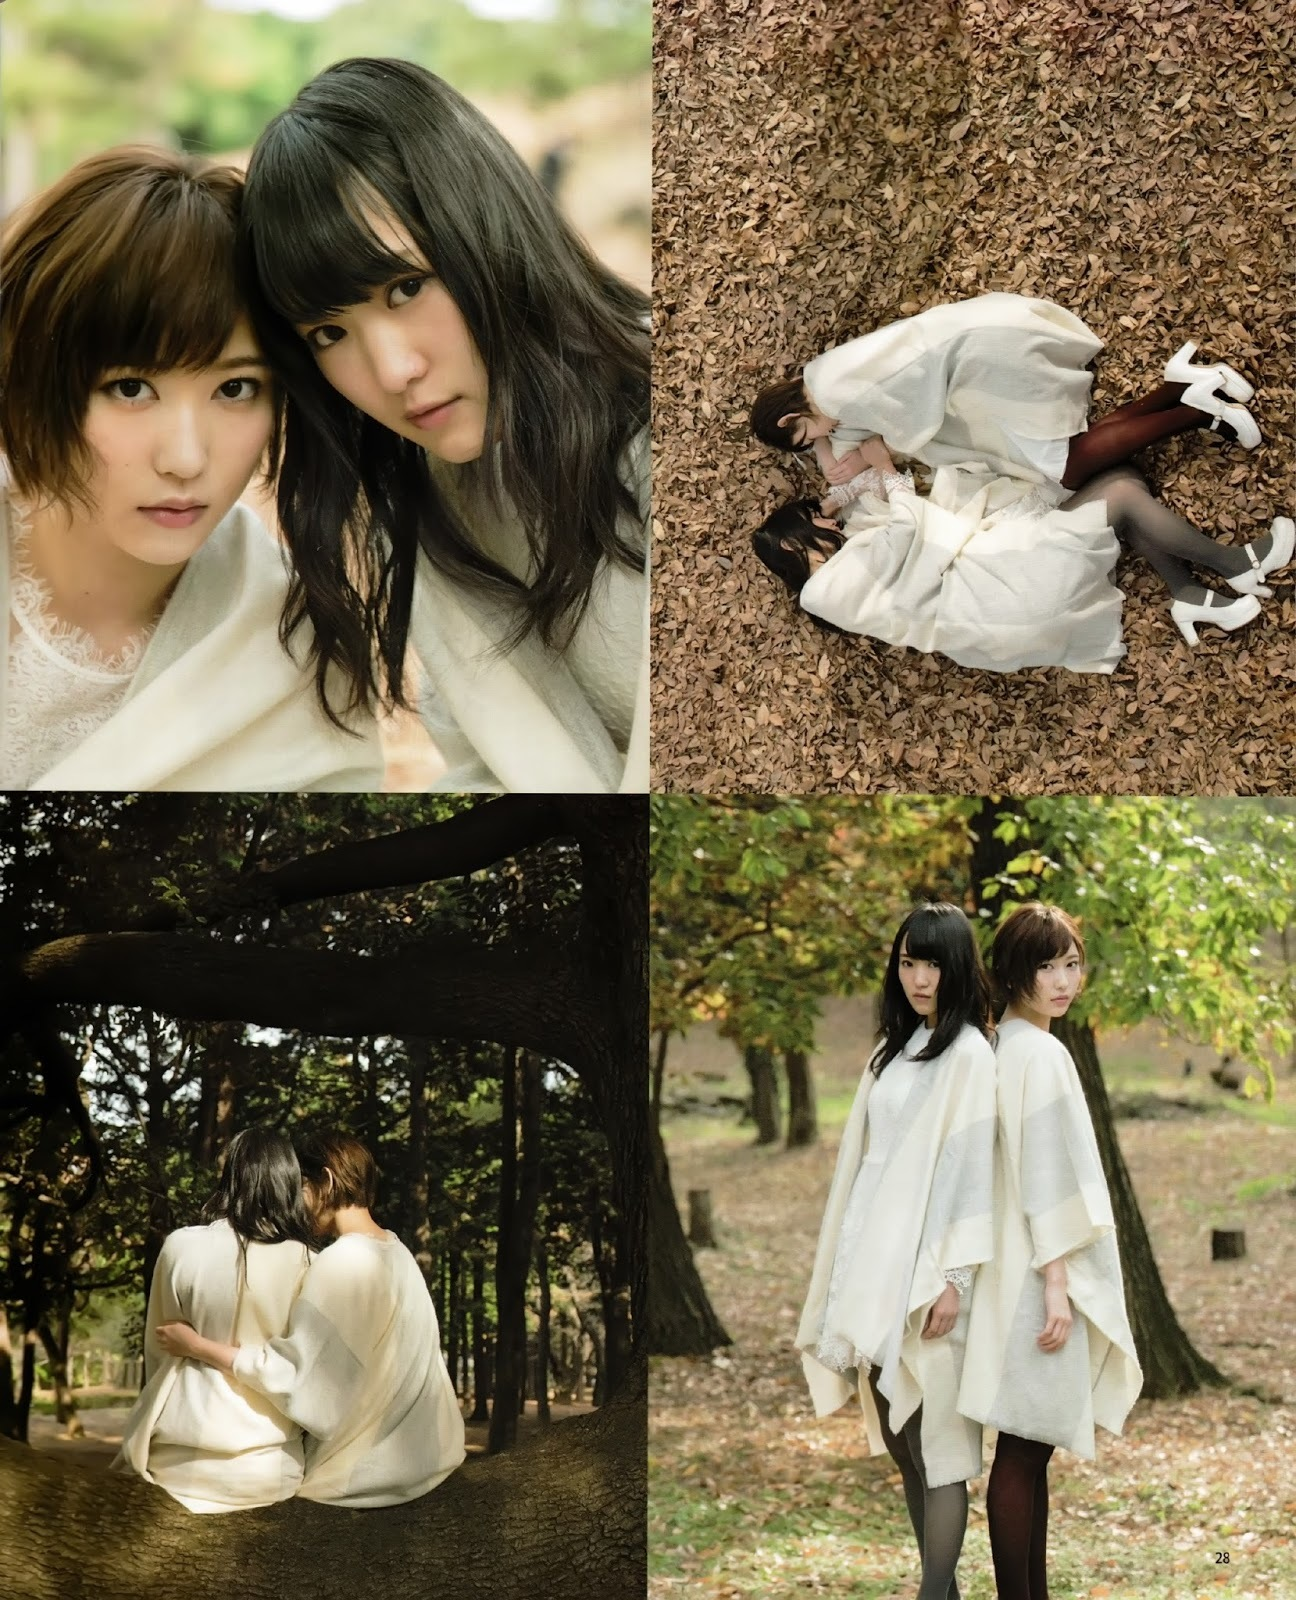 欅坂46 菅井友香 志田愛佳 ボム 2017年02号 1